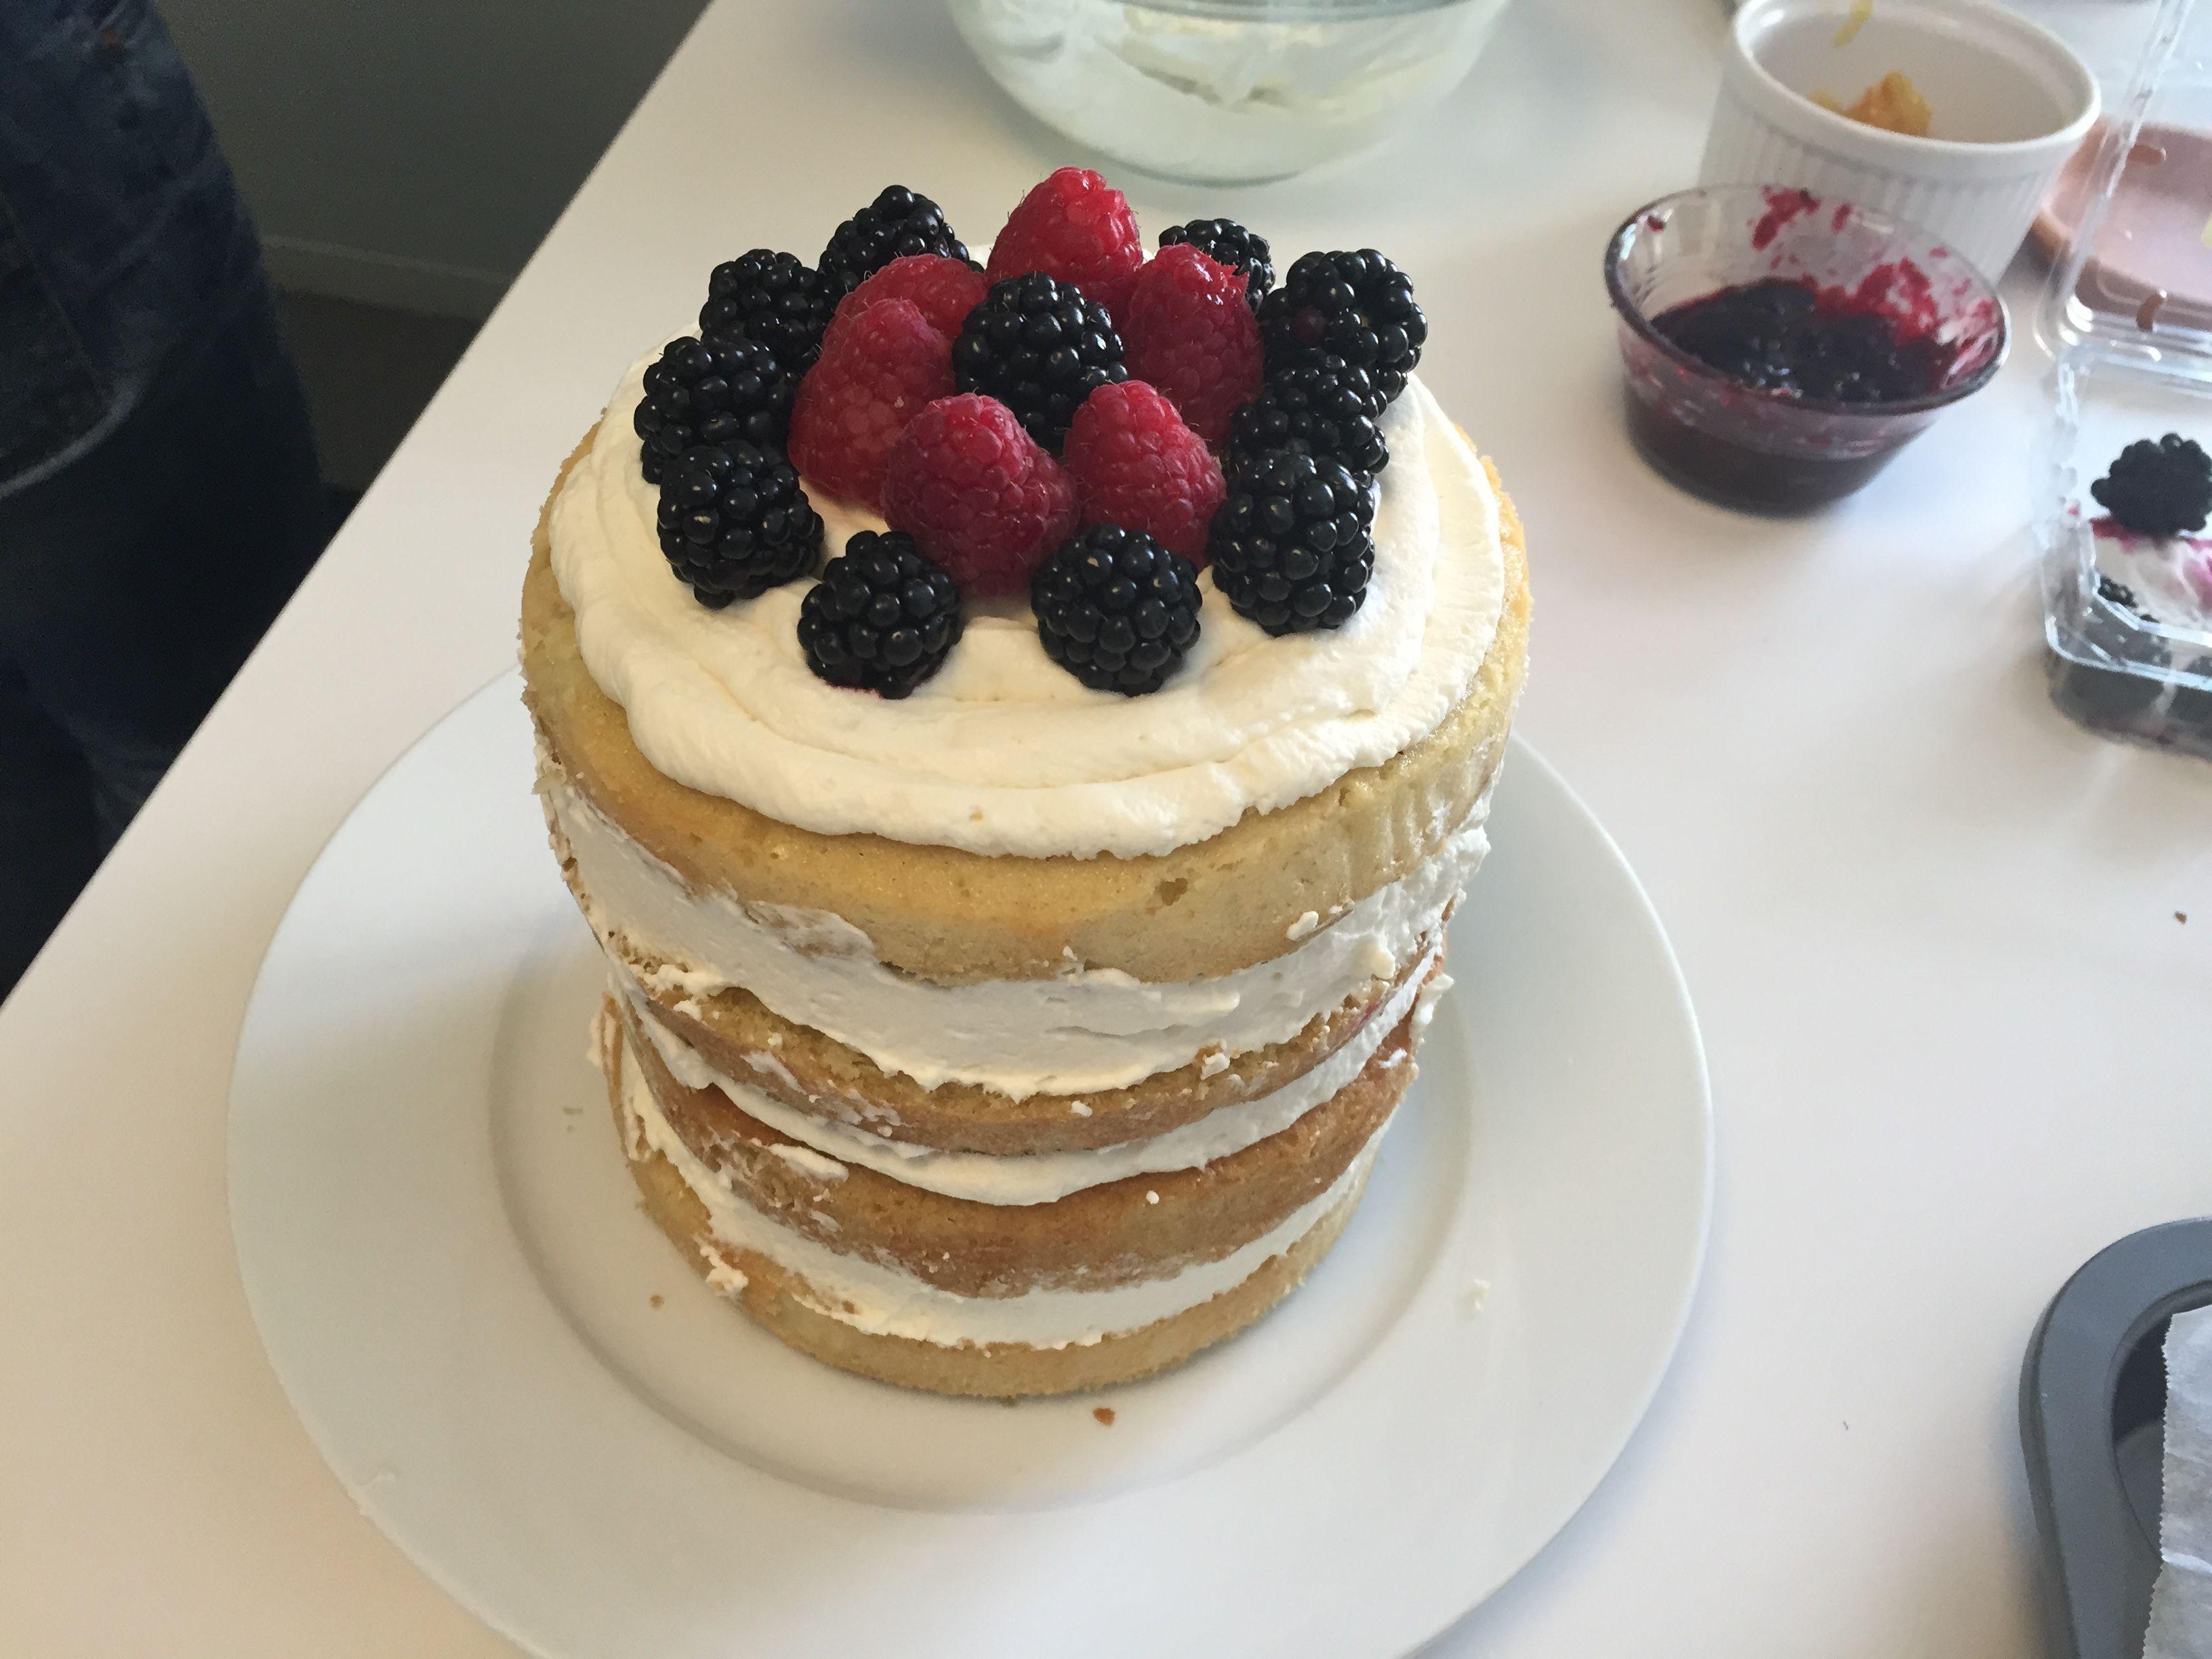 Naked Vanilla Cake with Mascarpone and Berries AllrecipesPhoto